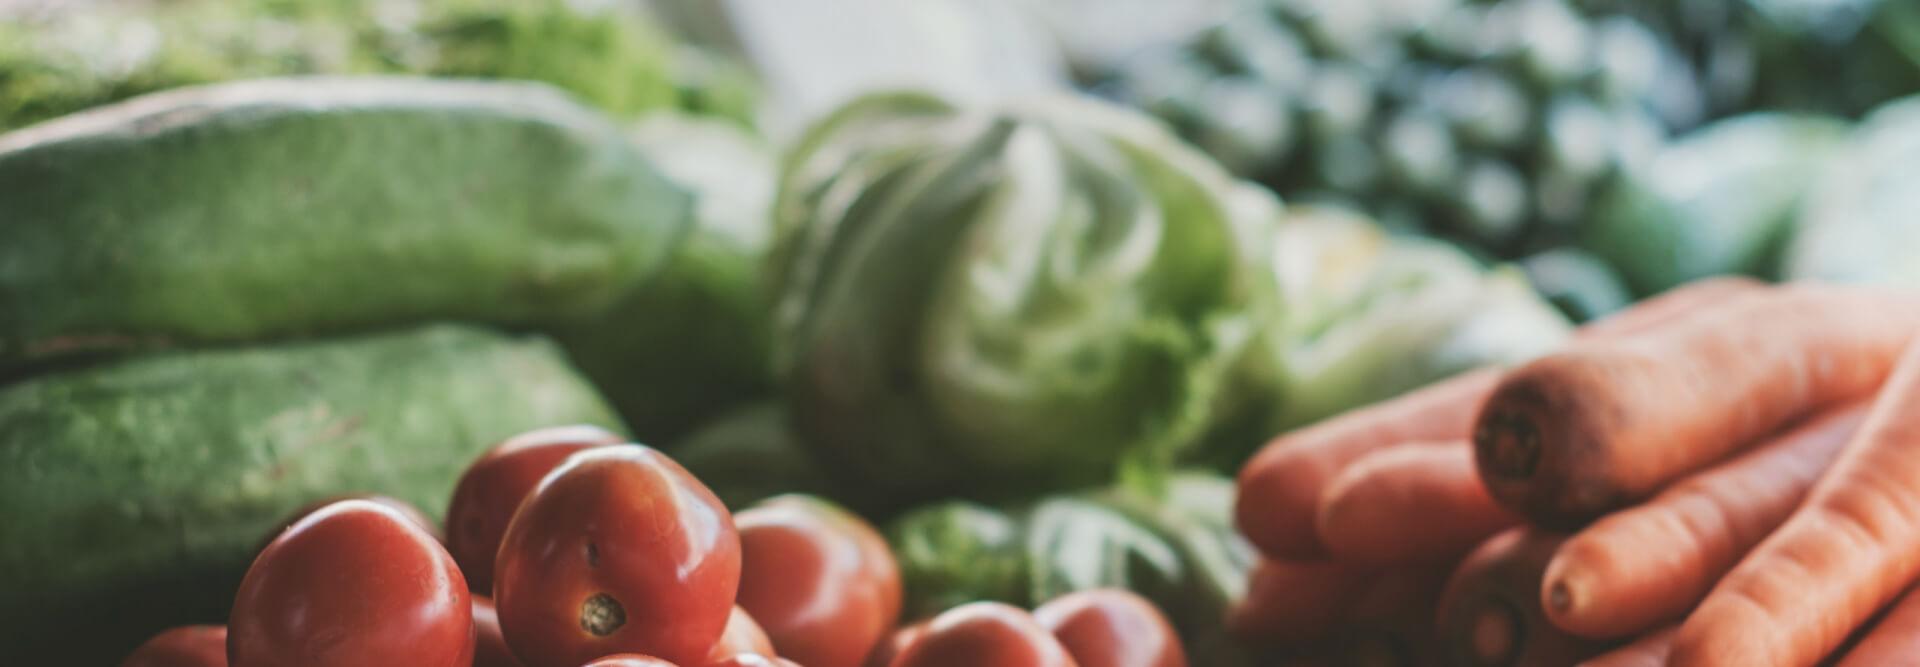 Eat organic and fresh